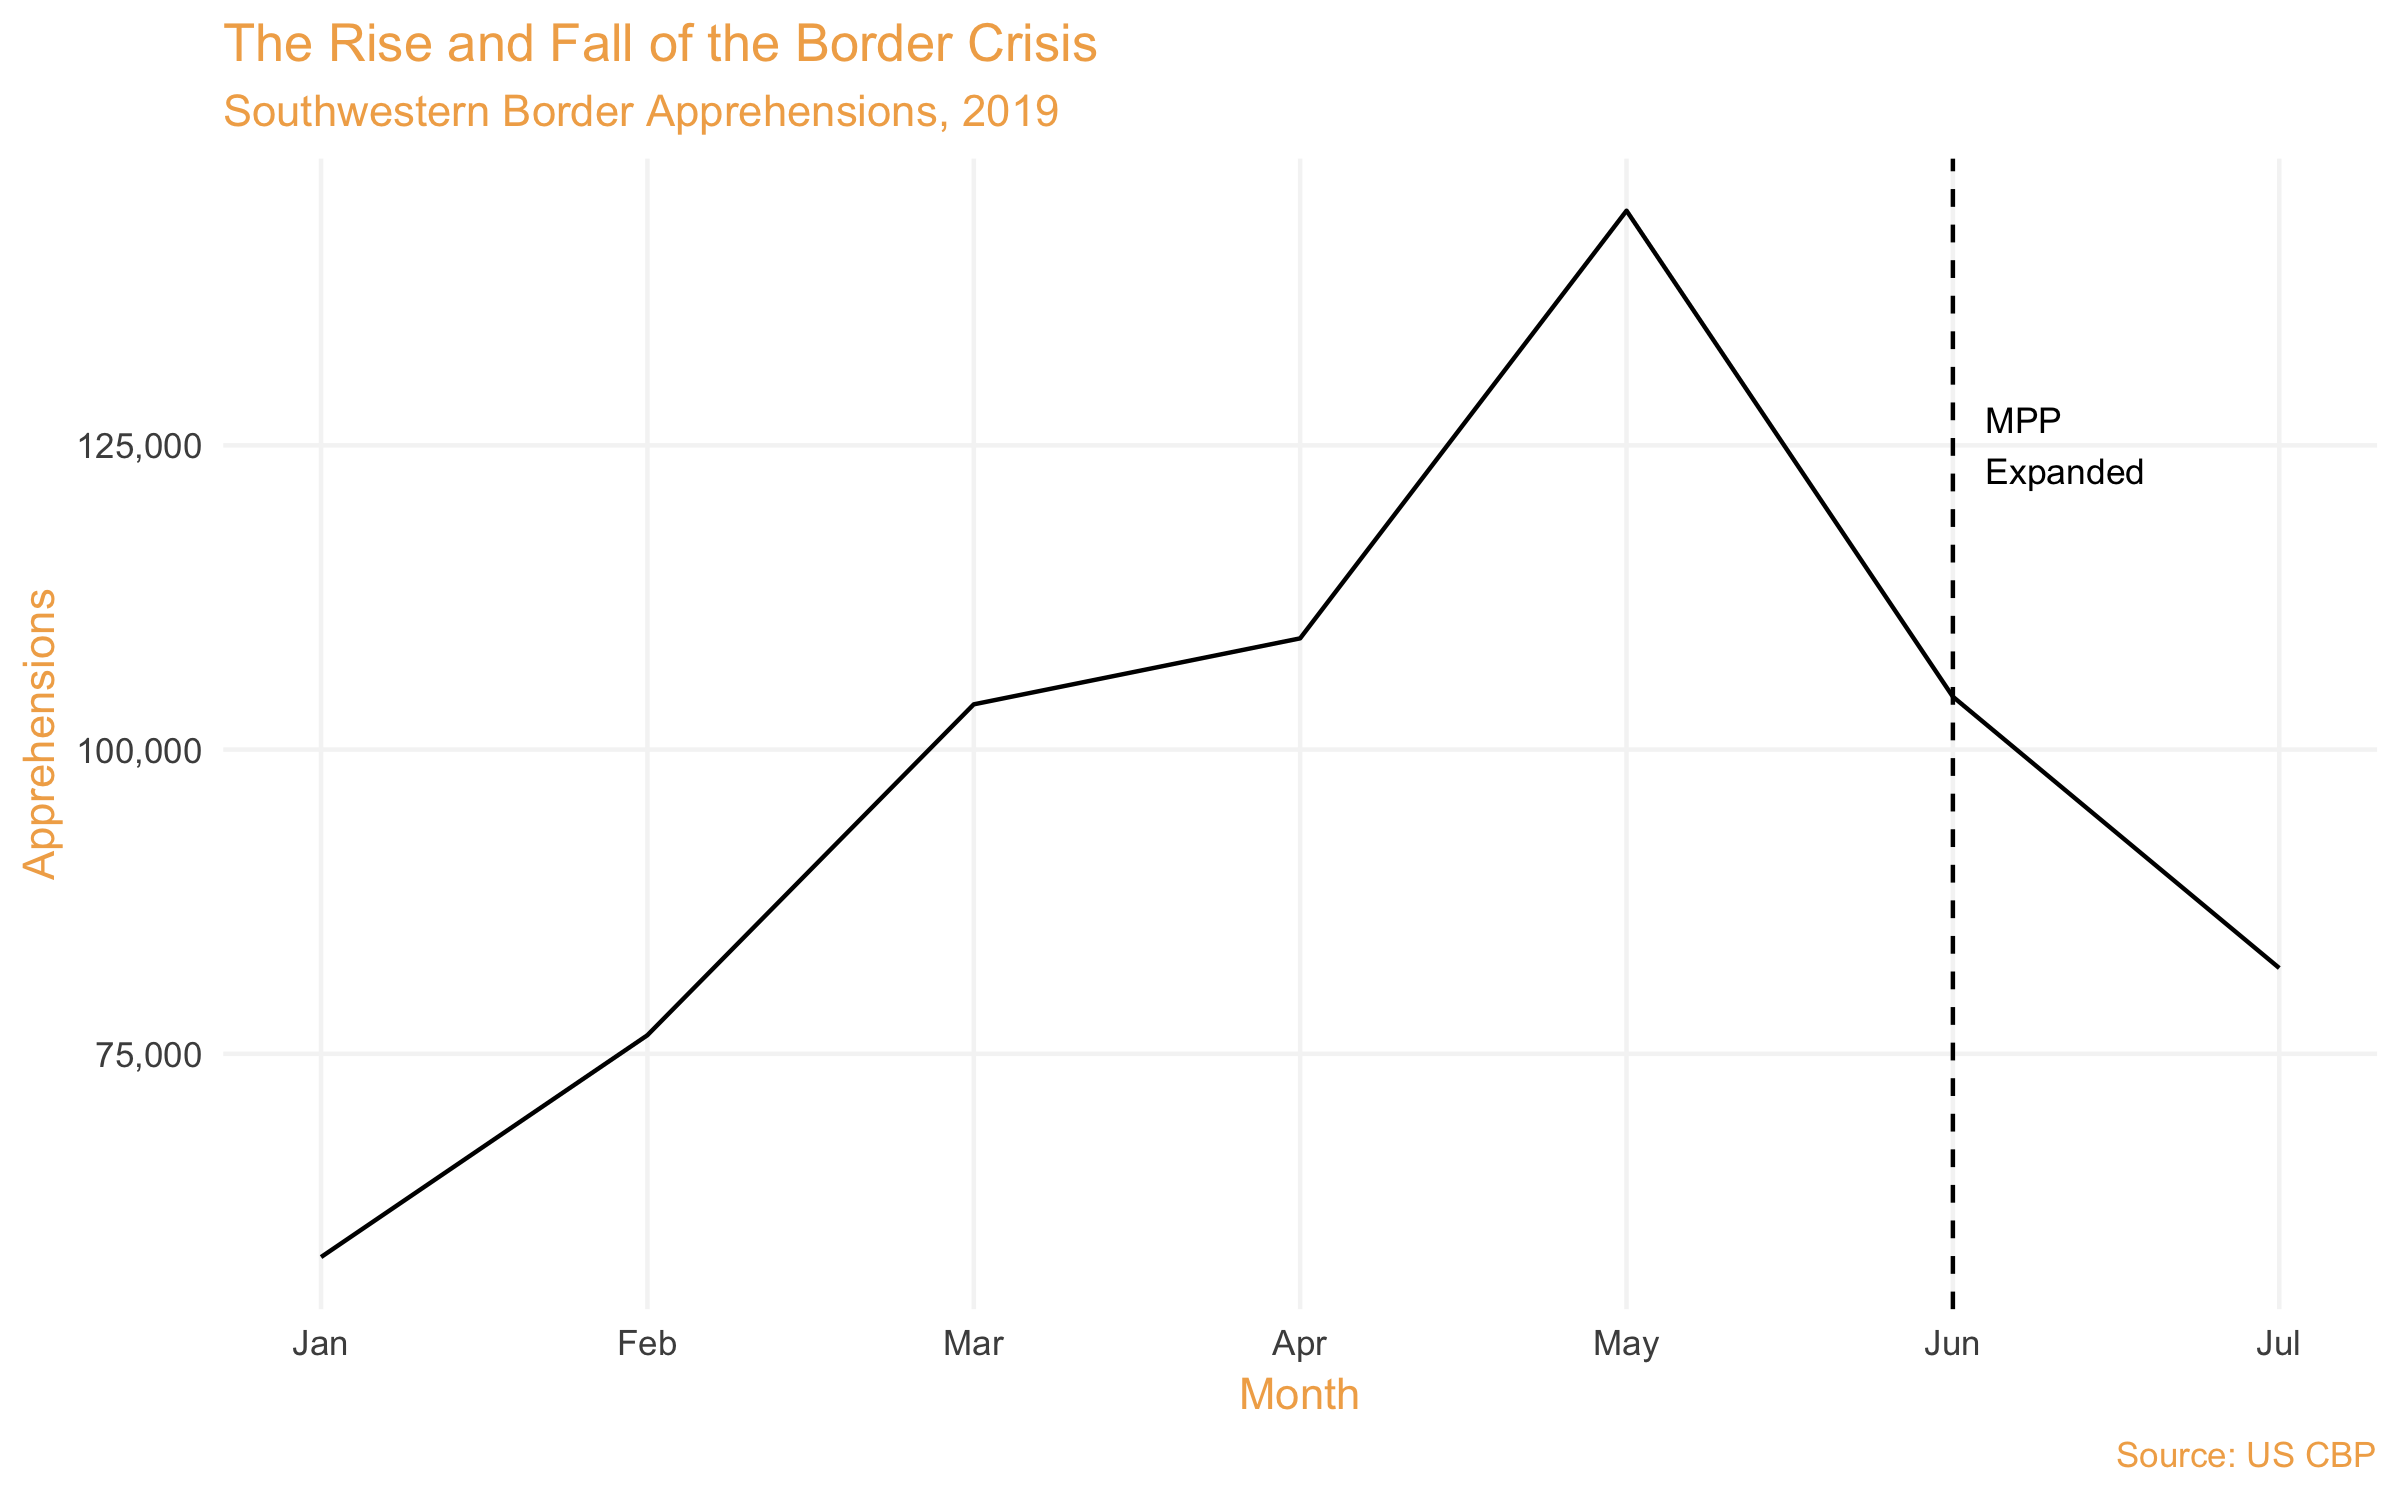 CBP apprehensions